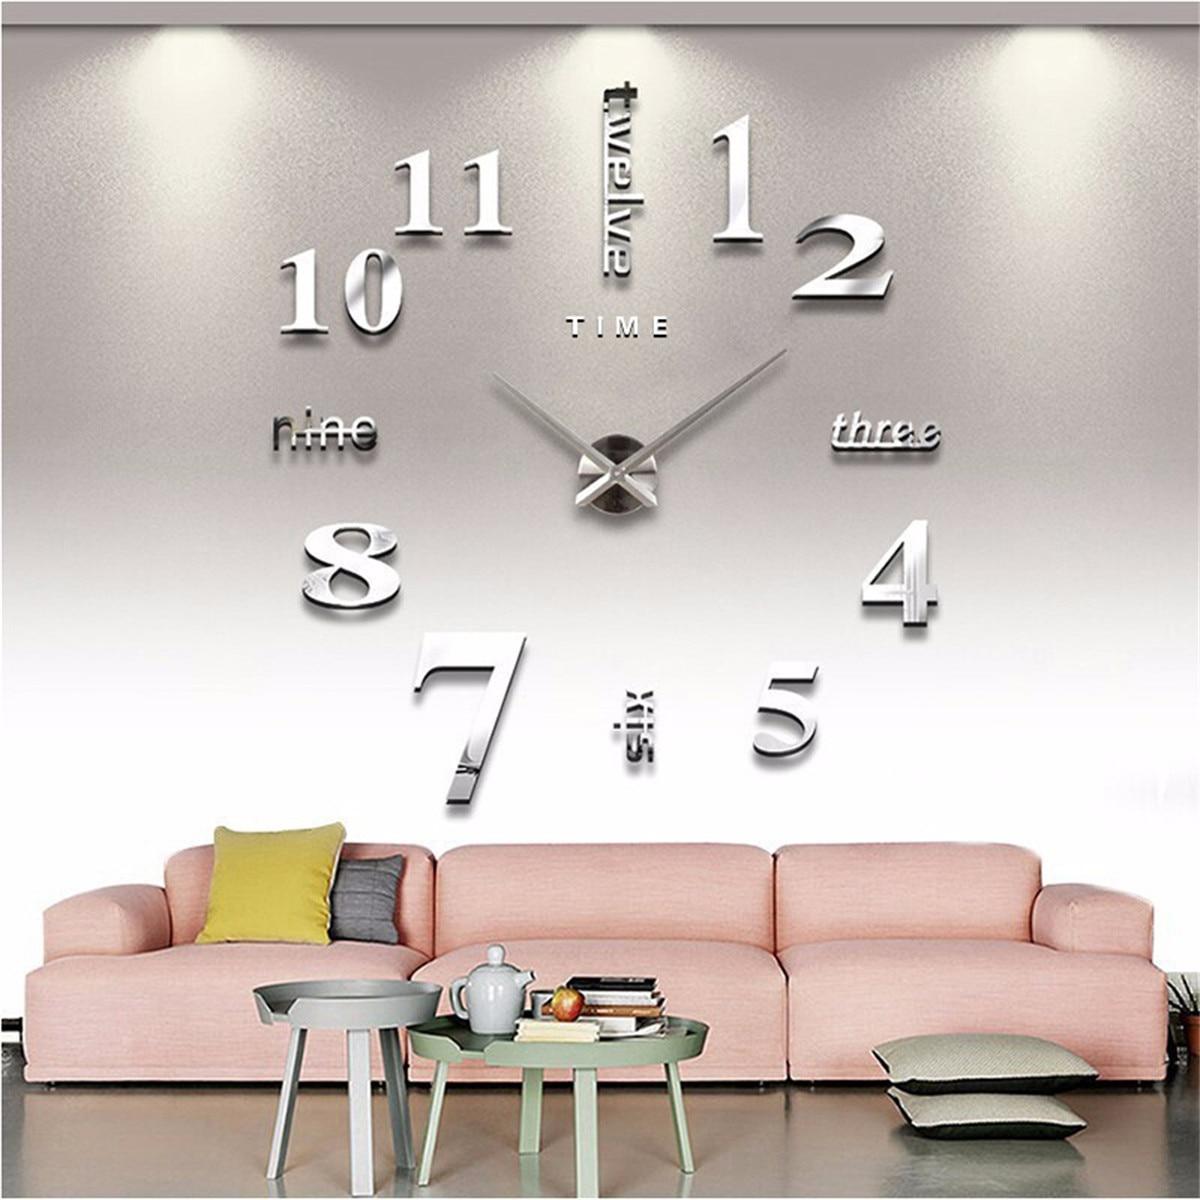 3D Wall Clock Mirror Wall Stickers Creative DIY Wall Clocks Removable Art Decal Sticker Home Decor Living Room Quartz Needle Hot